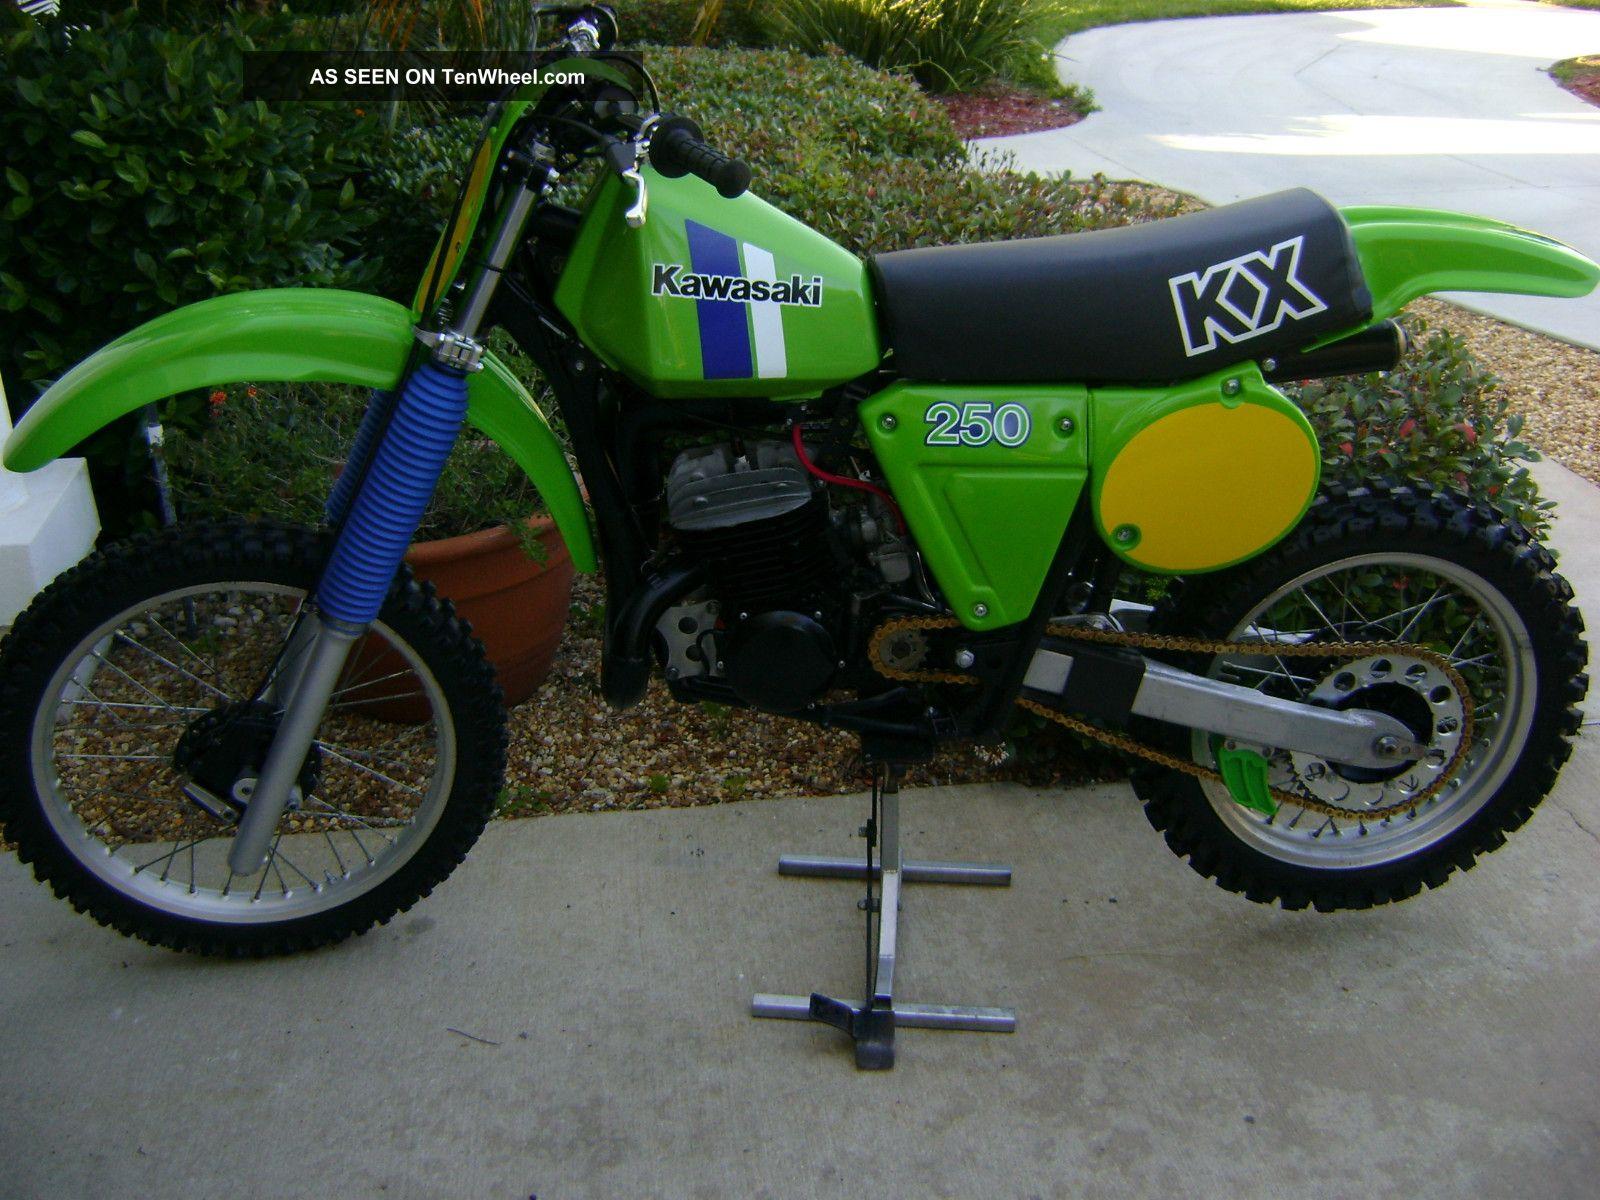 1980 Kawasaki Kx 250 - Ahrma - Isdt - Vintage Motocross KX photo